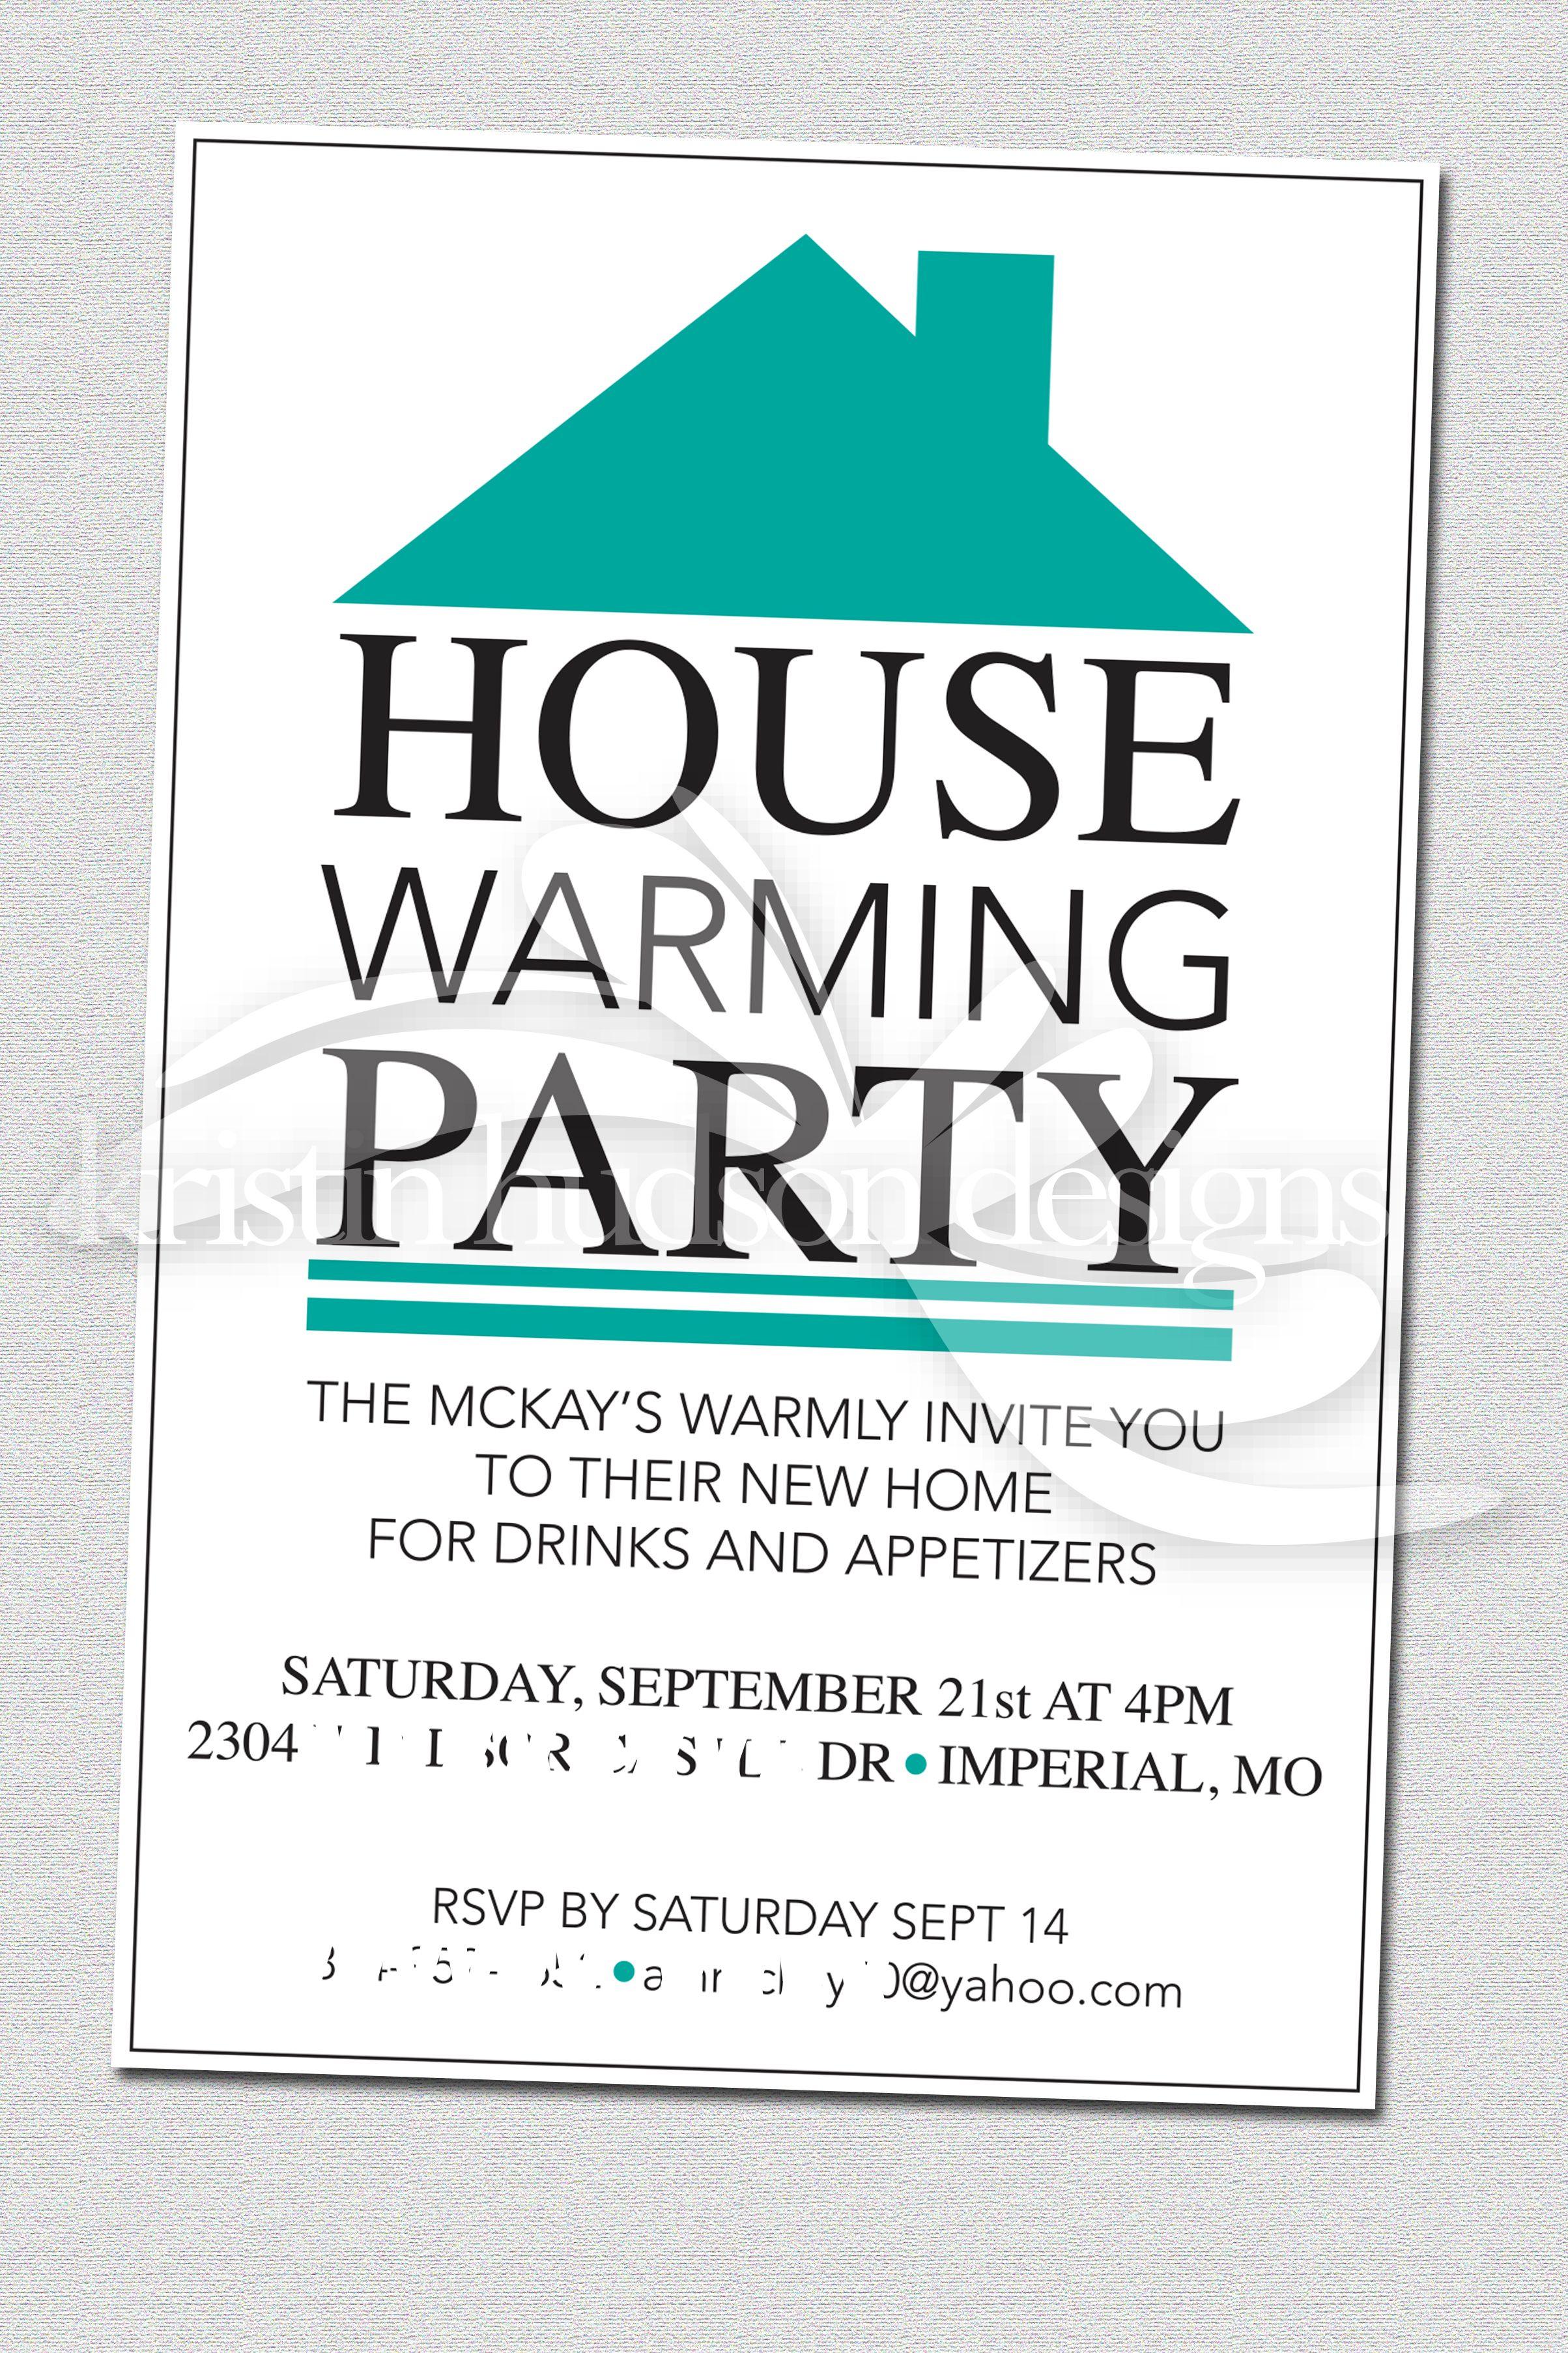 House warming party invite housewarming invitation templates cards wording ideas also art fiesta invitaciones muebles rh ar pinterest